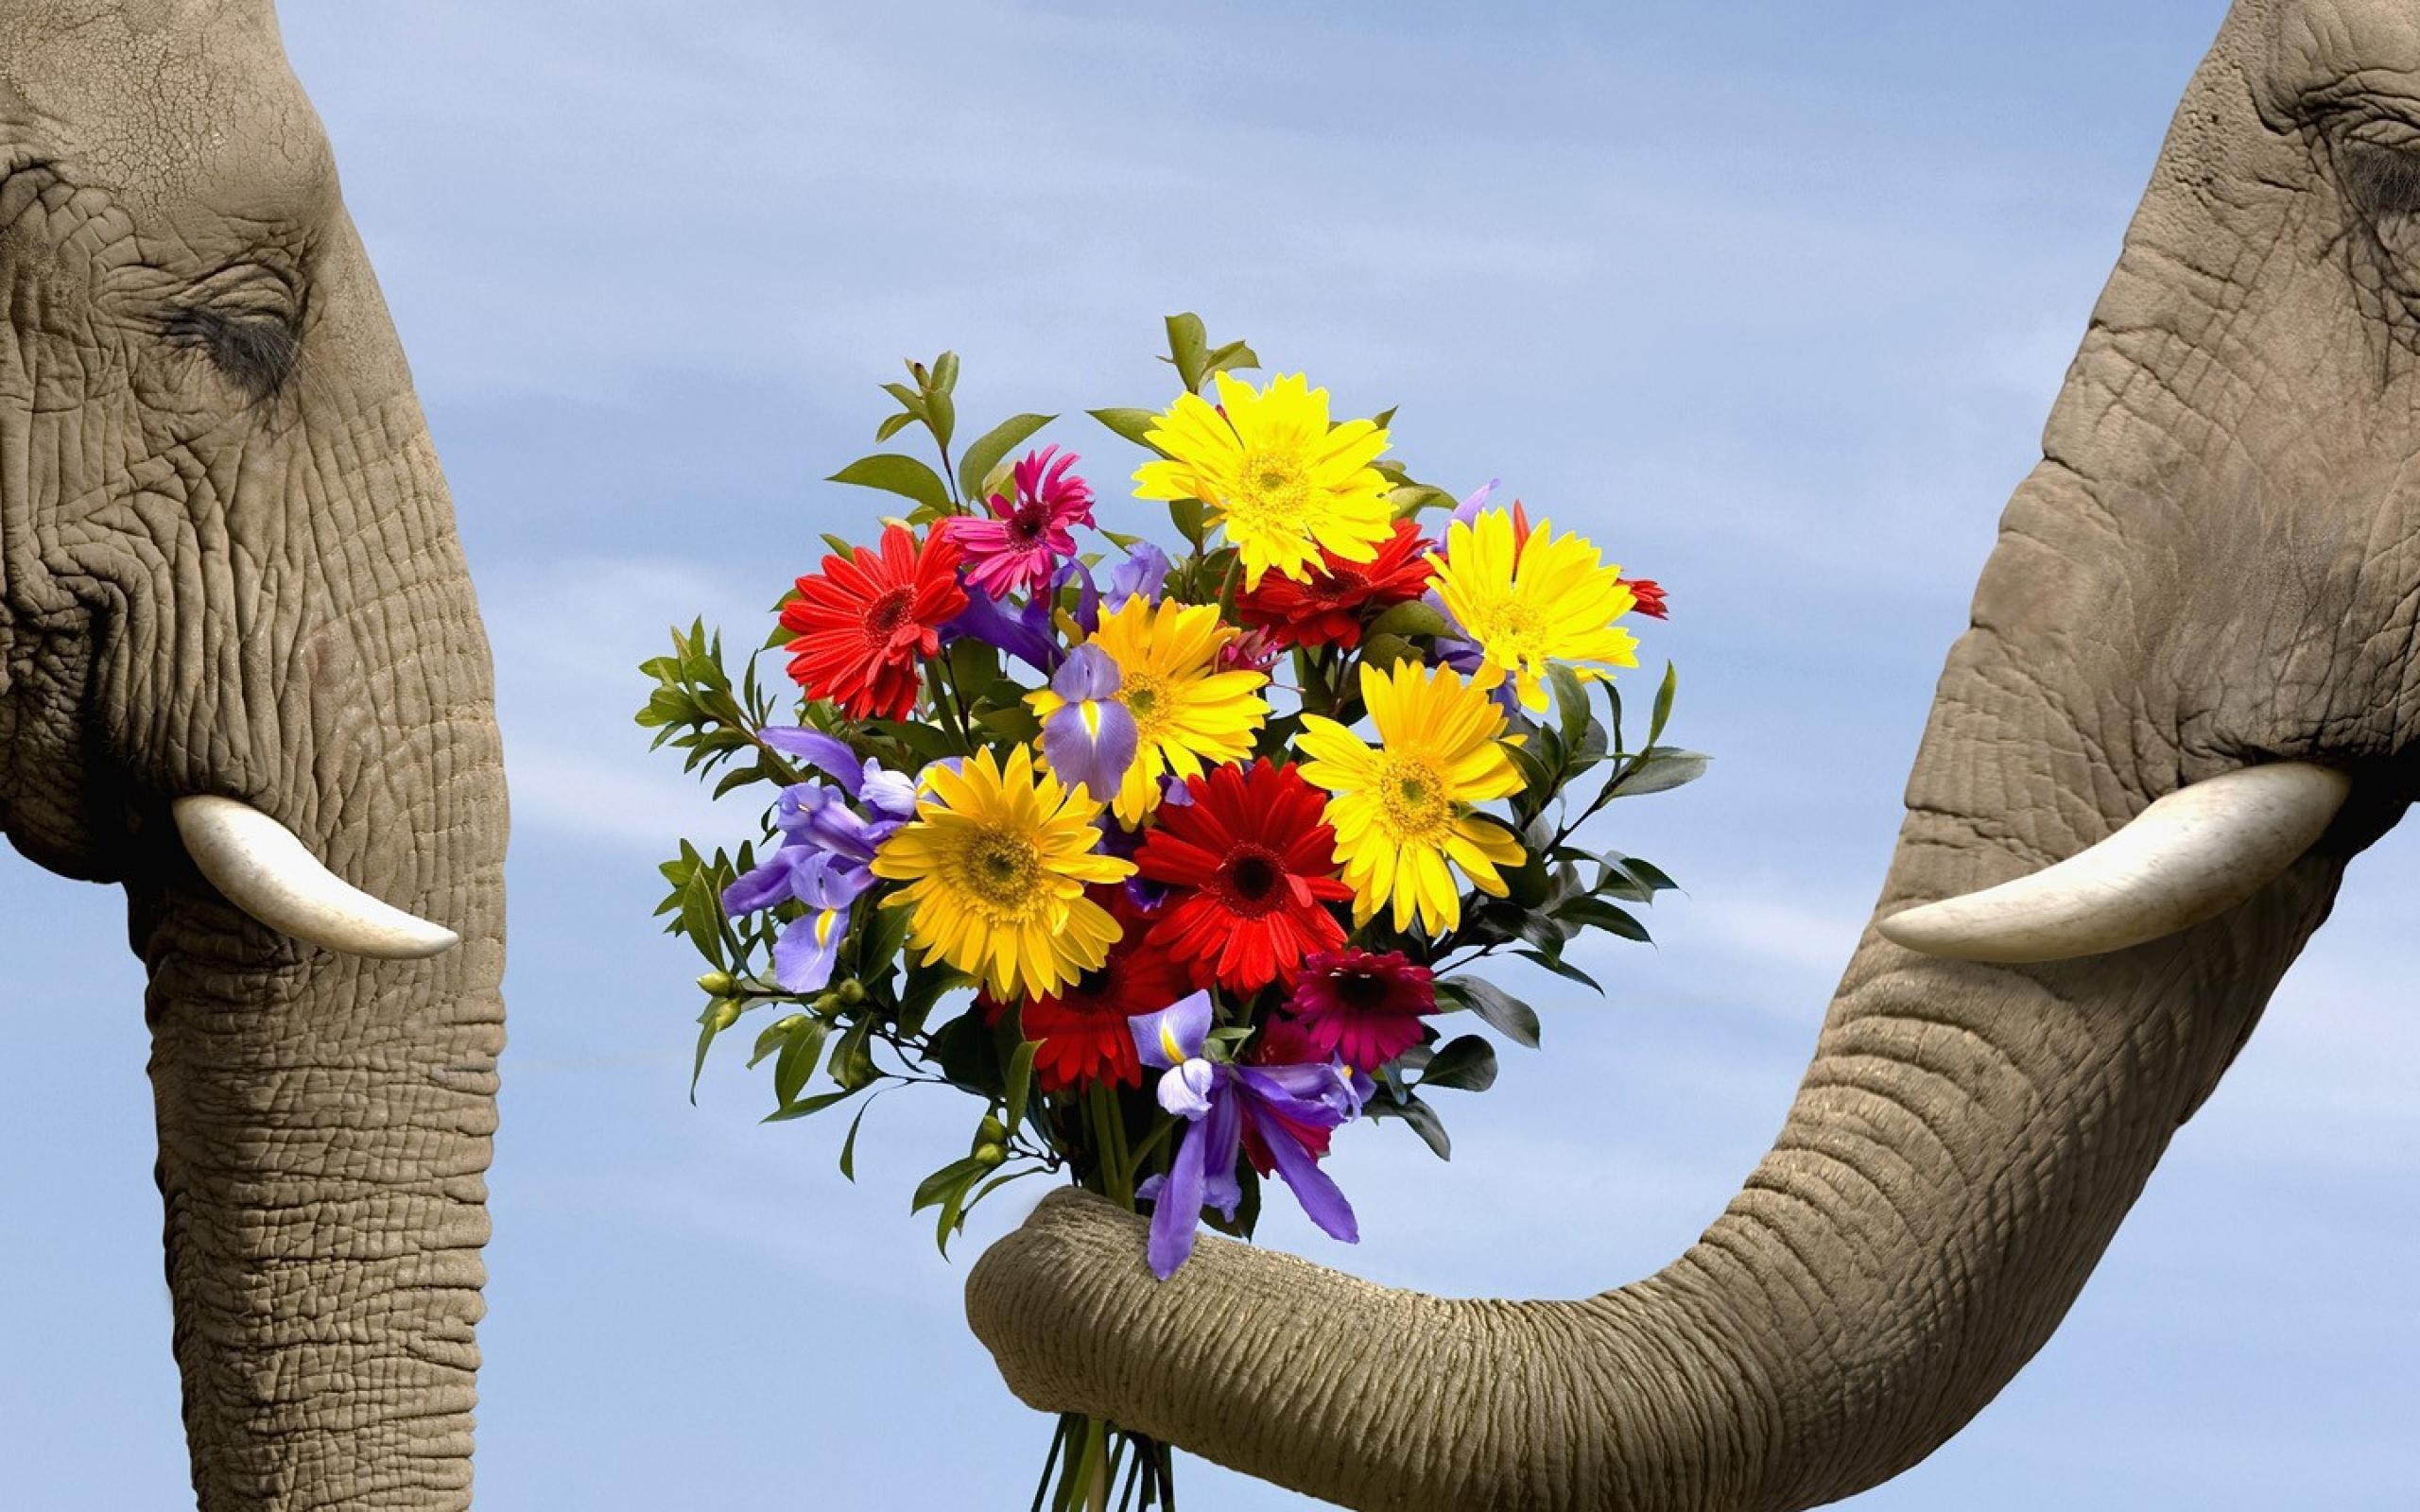 Hintergrundbilder : Blumen, Gelb, Elefant, Frühling, KUNST, Blume ...